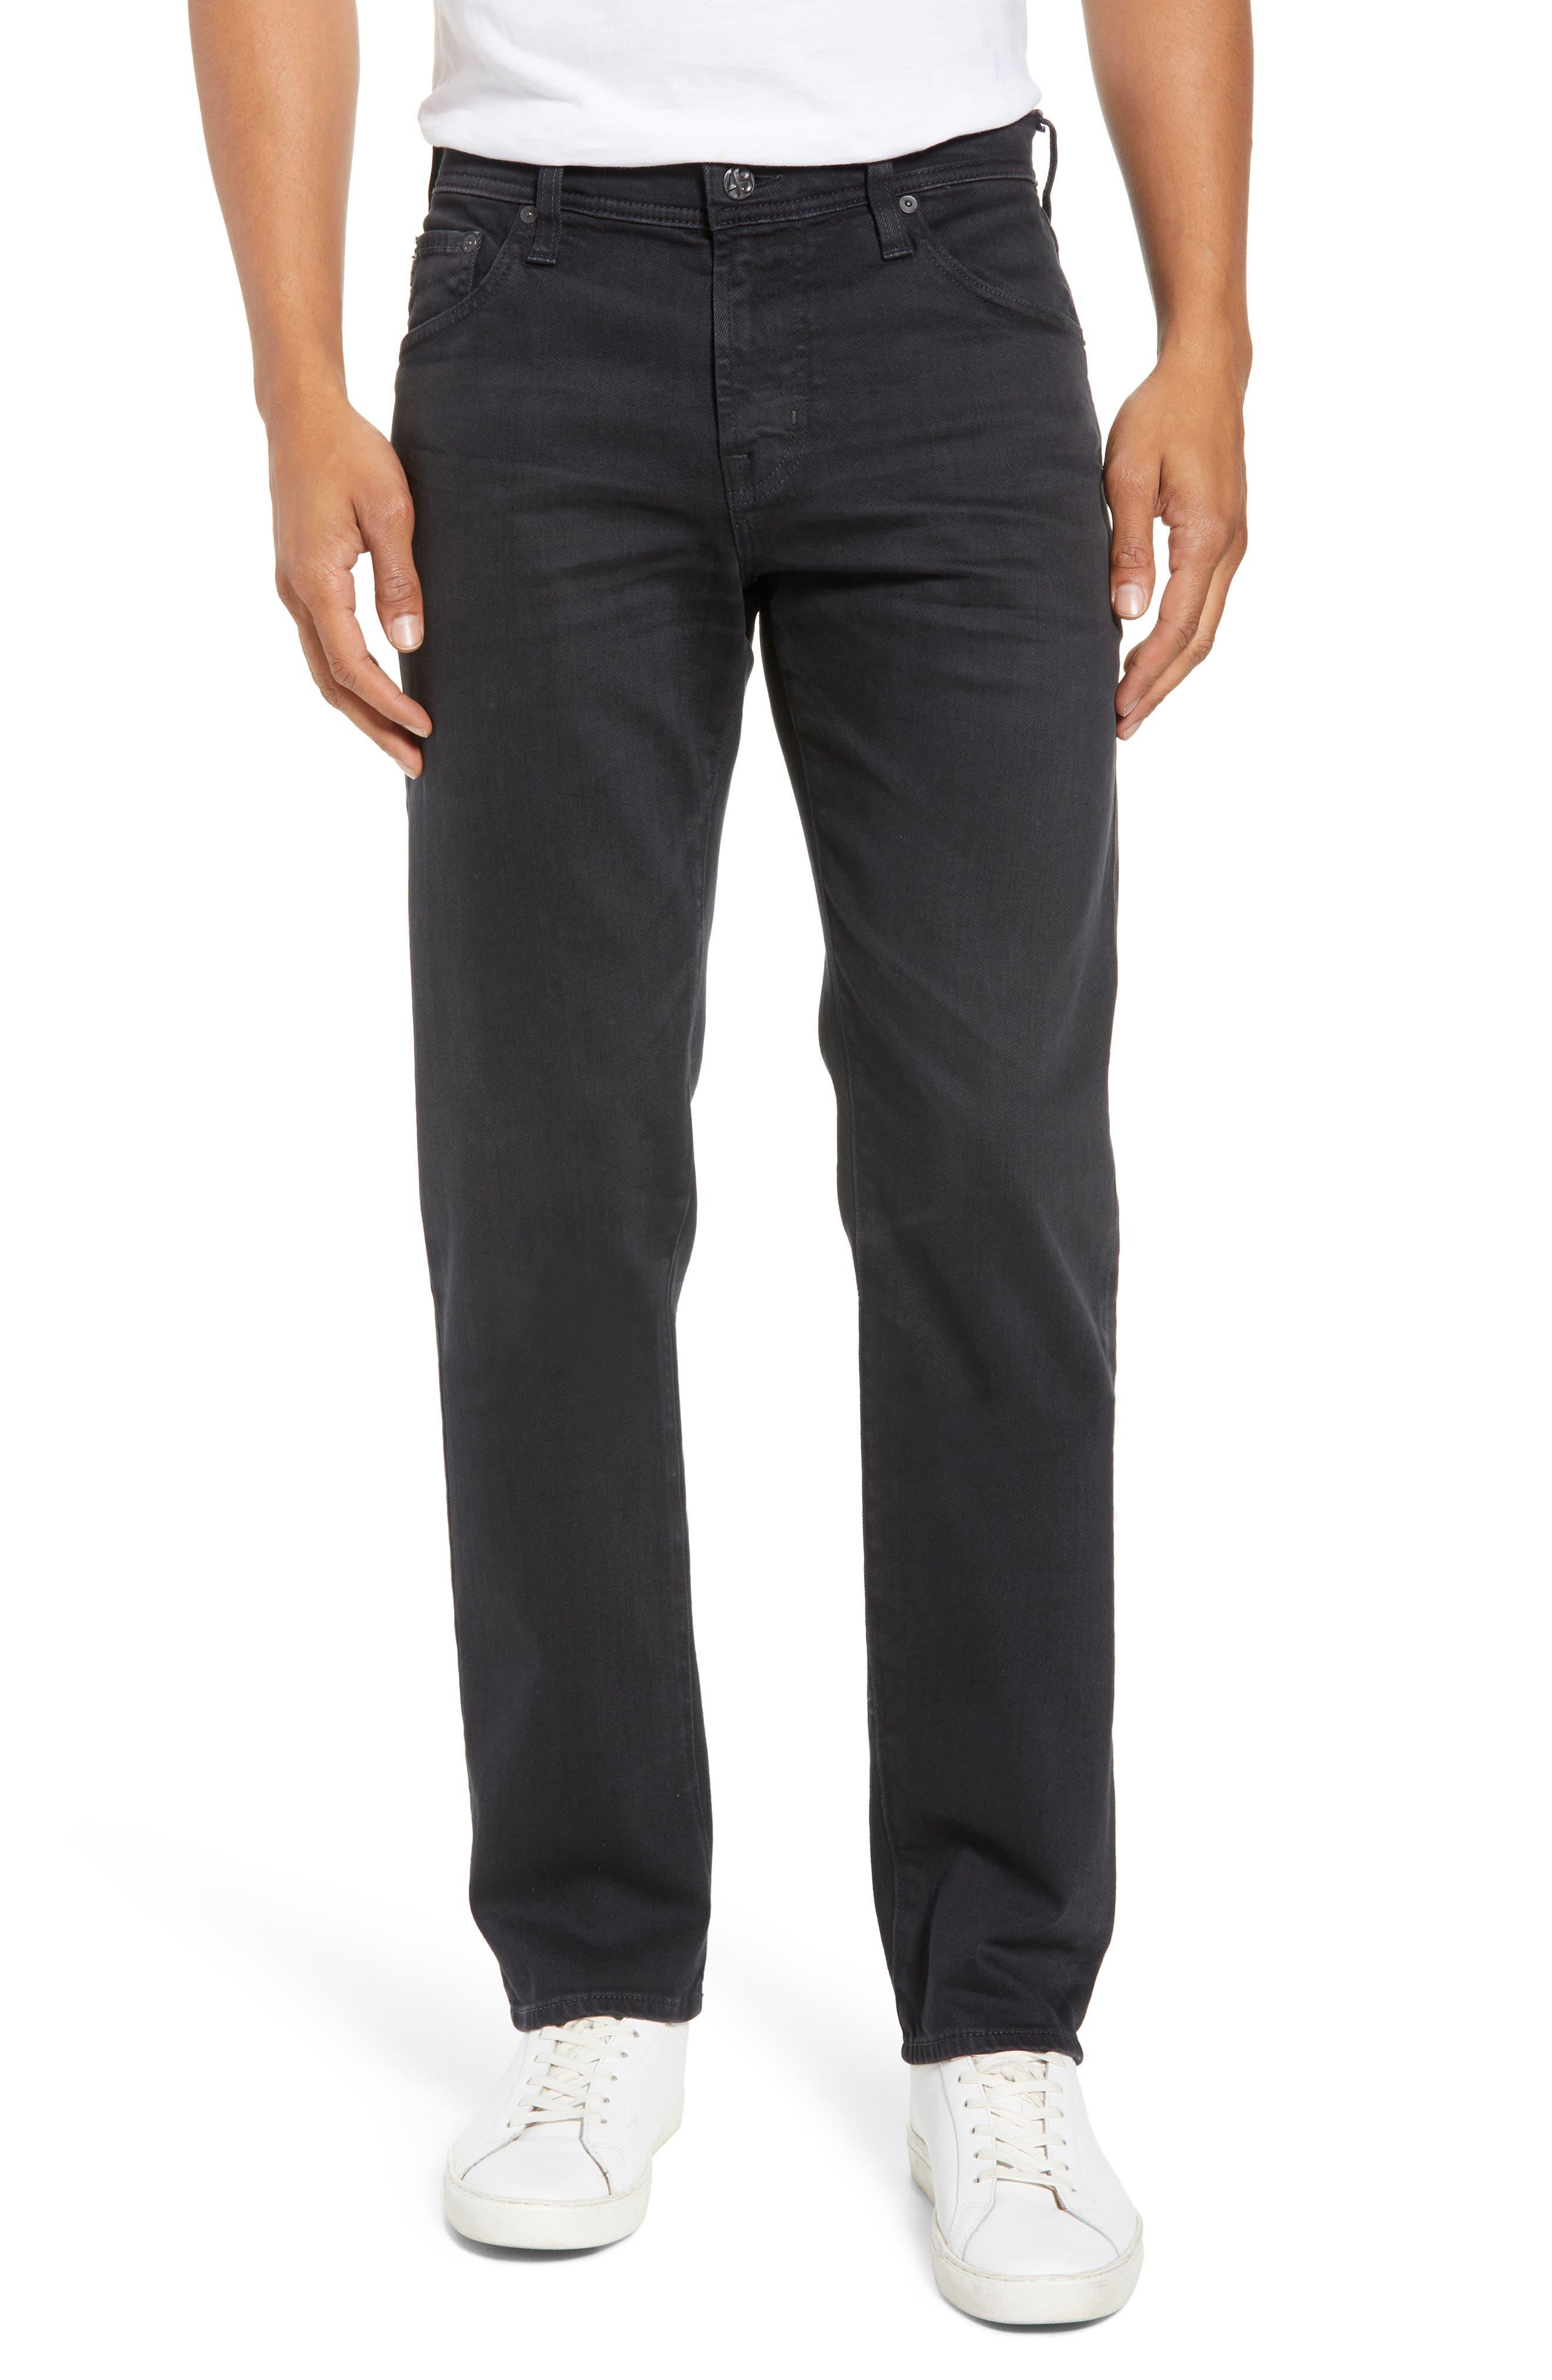 Tellis Slim Fit Jeans,                             Main thumbnail 1, color,                             7 YEARS GREY STONE